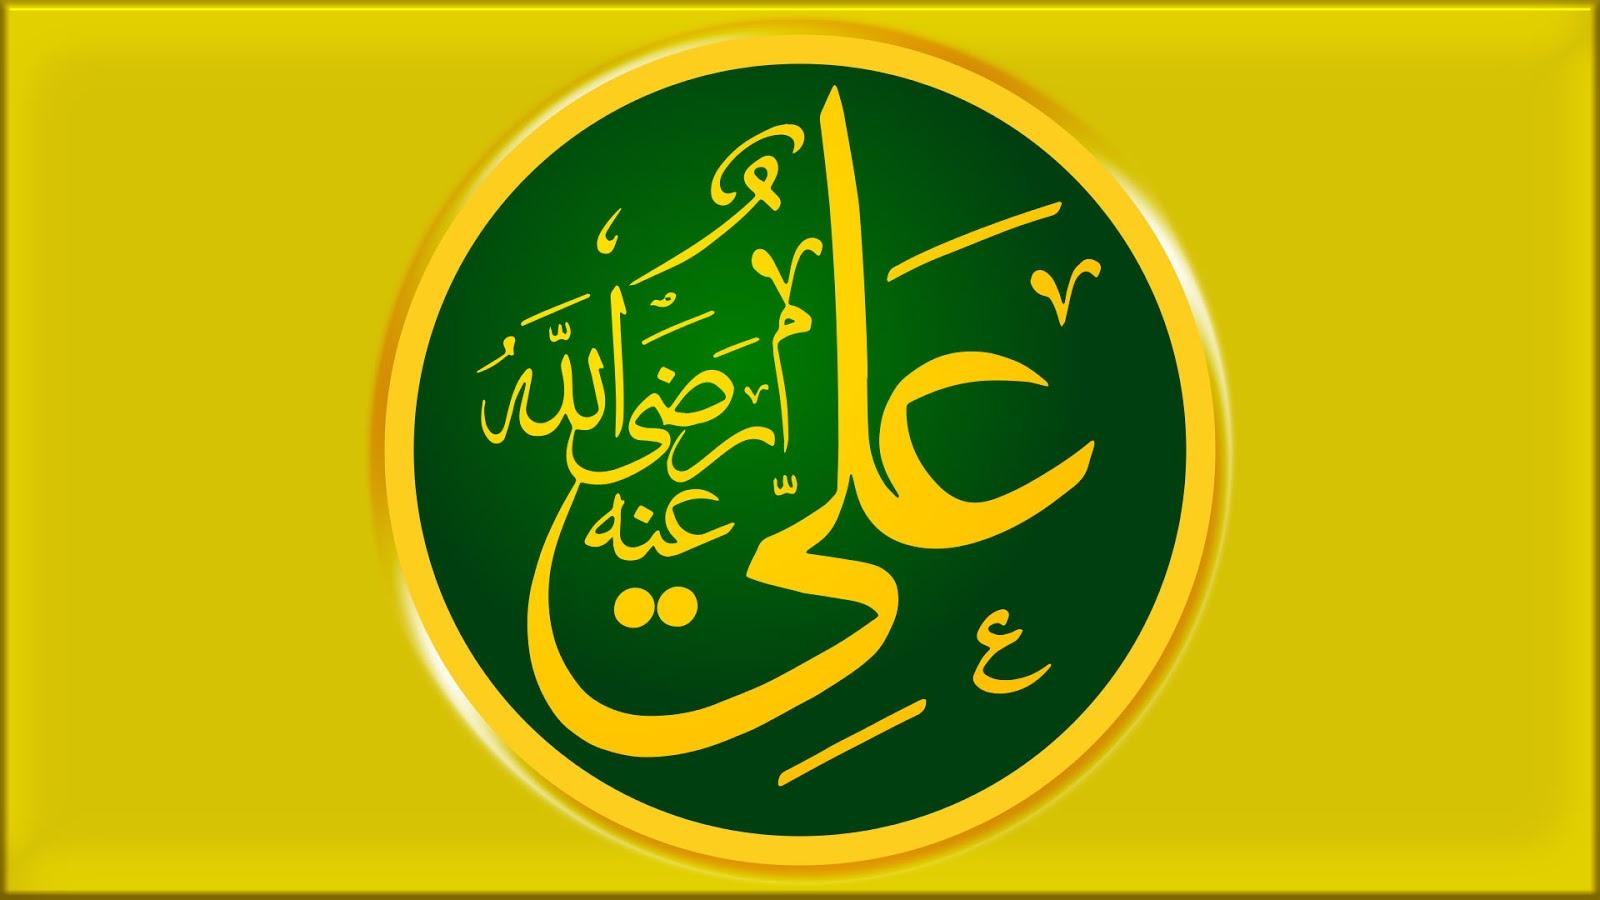 Ali Ibn Abi Talib Calligraphy